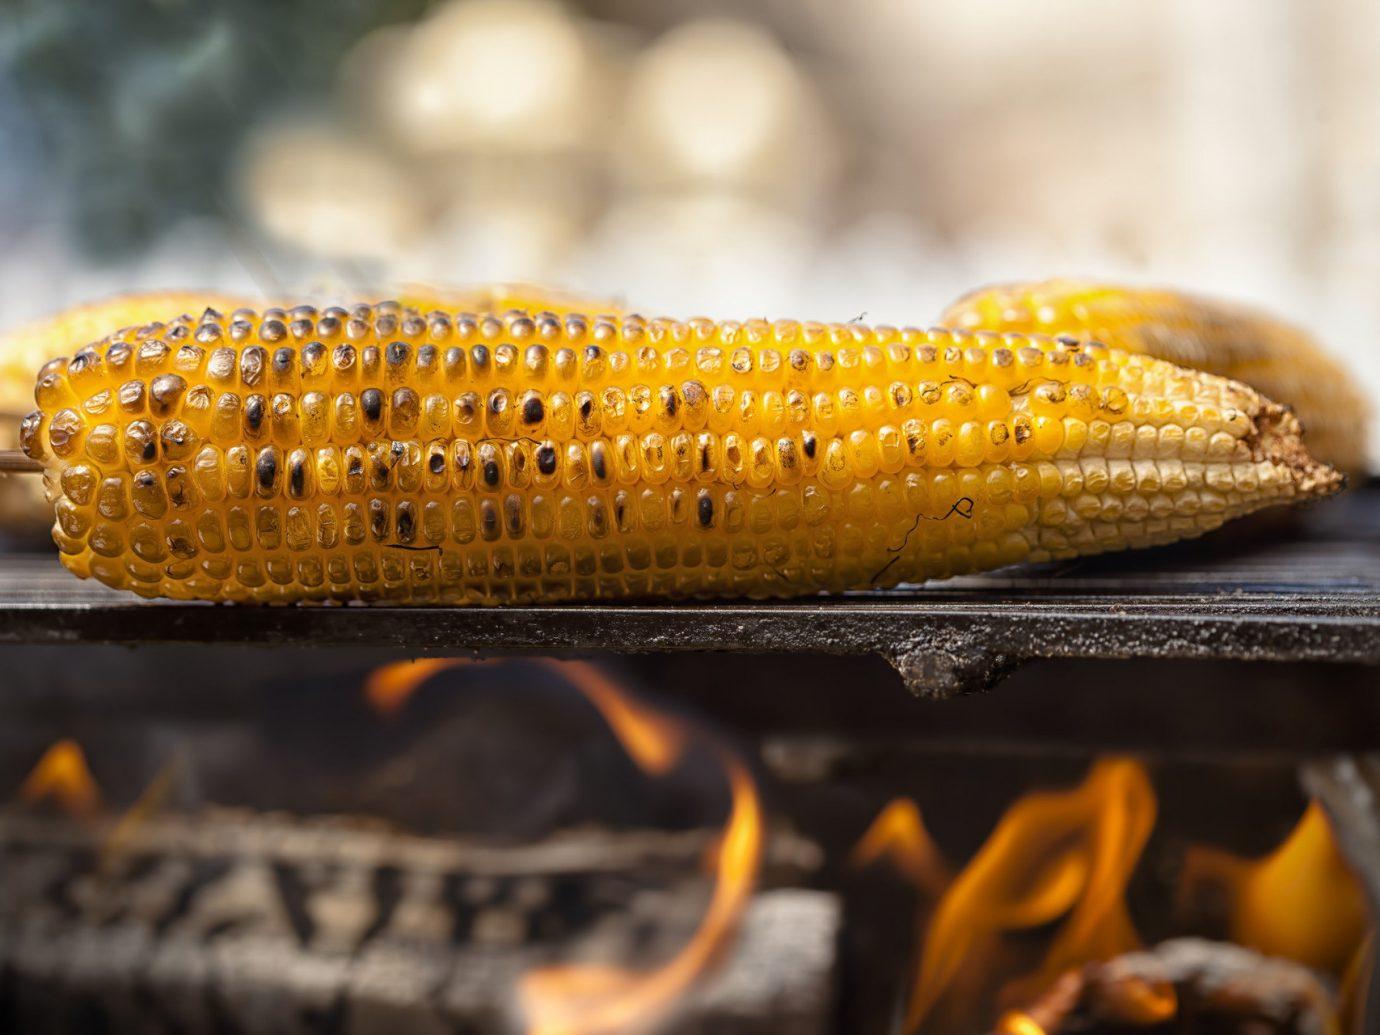 Food + Drink corn on the cob indoor food yellow macro photography produce cuisine snack food corn